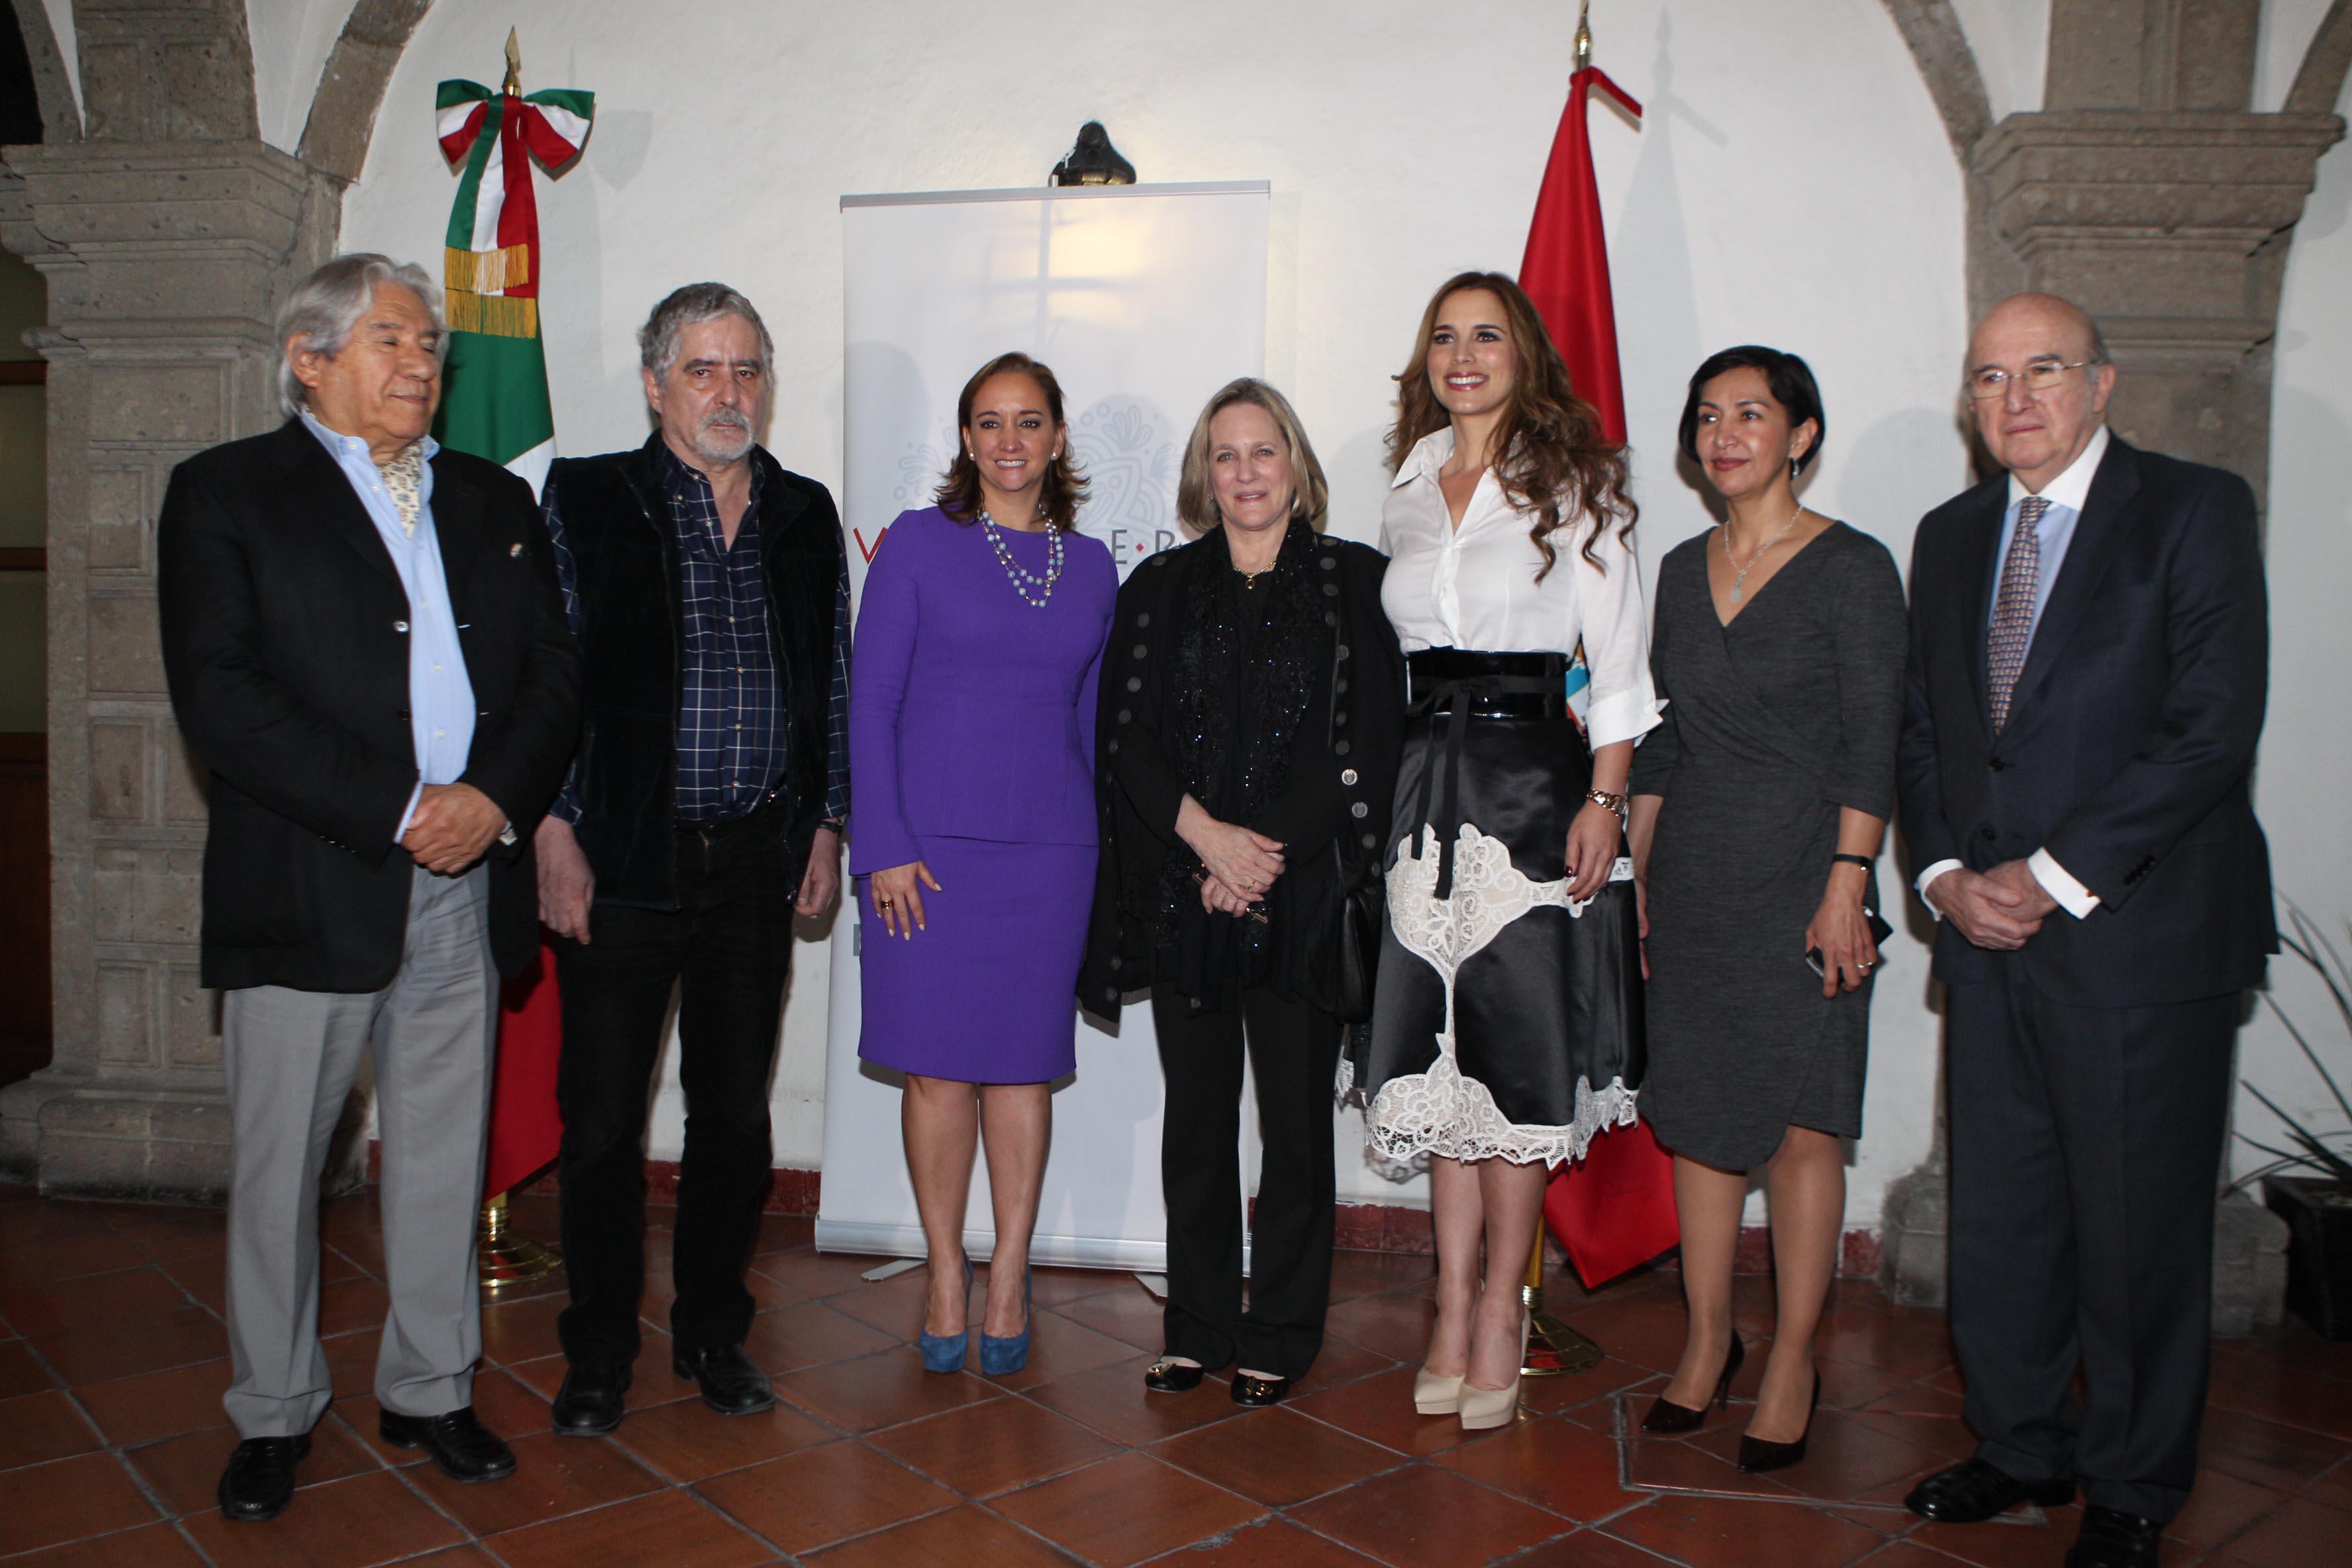 FOTO 2 La Canciller Claudia Ruiz Massieu inaugura exposici n de artistas peruanos.jpg